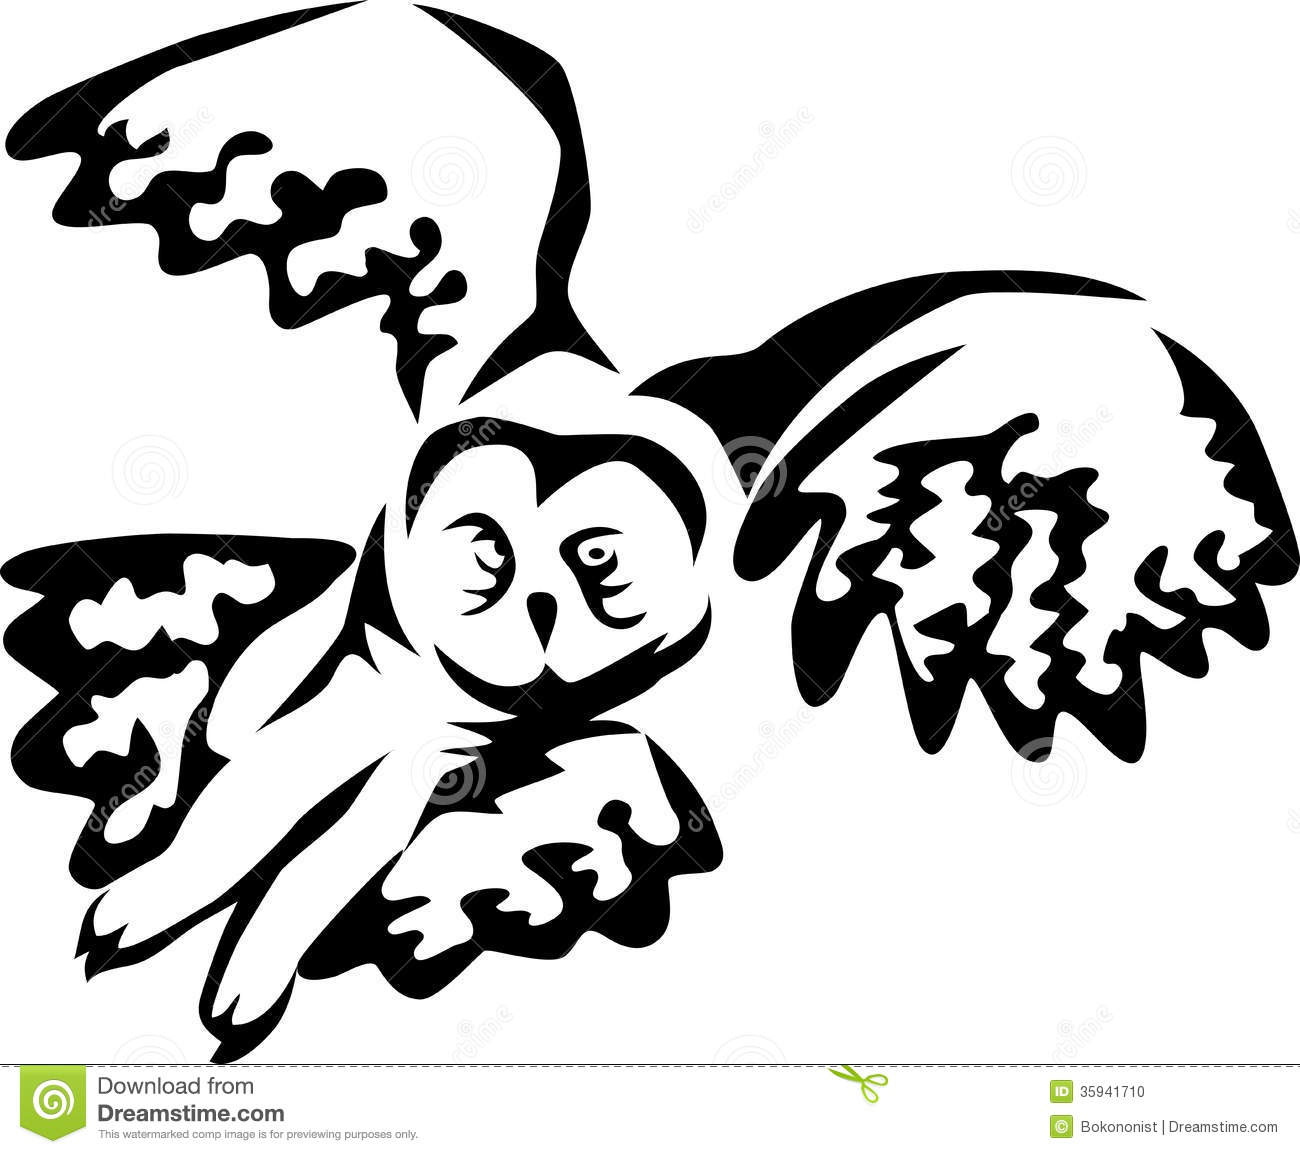 Flying owl stencil - photo#4